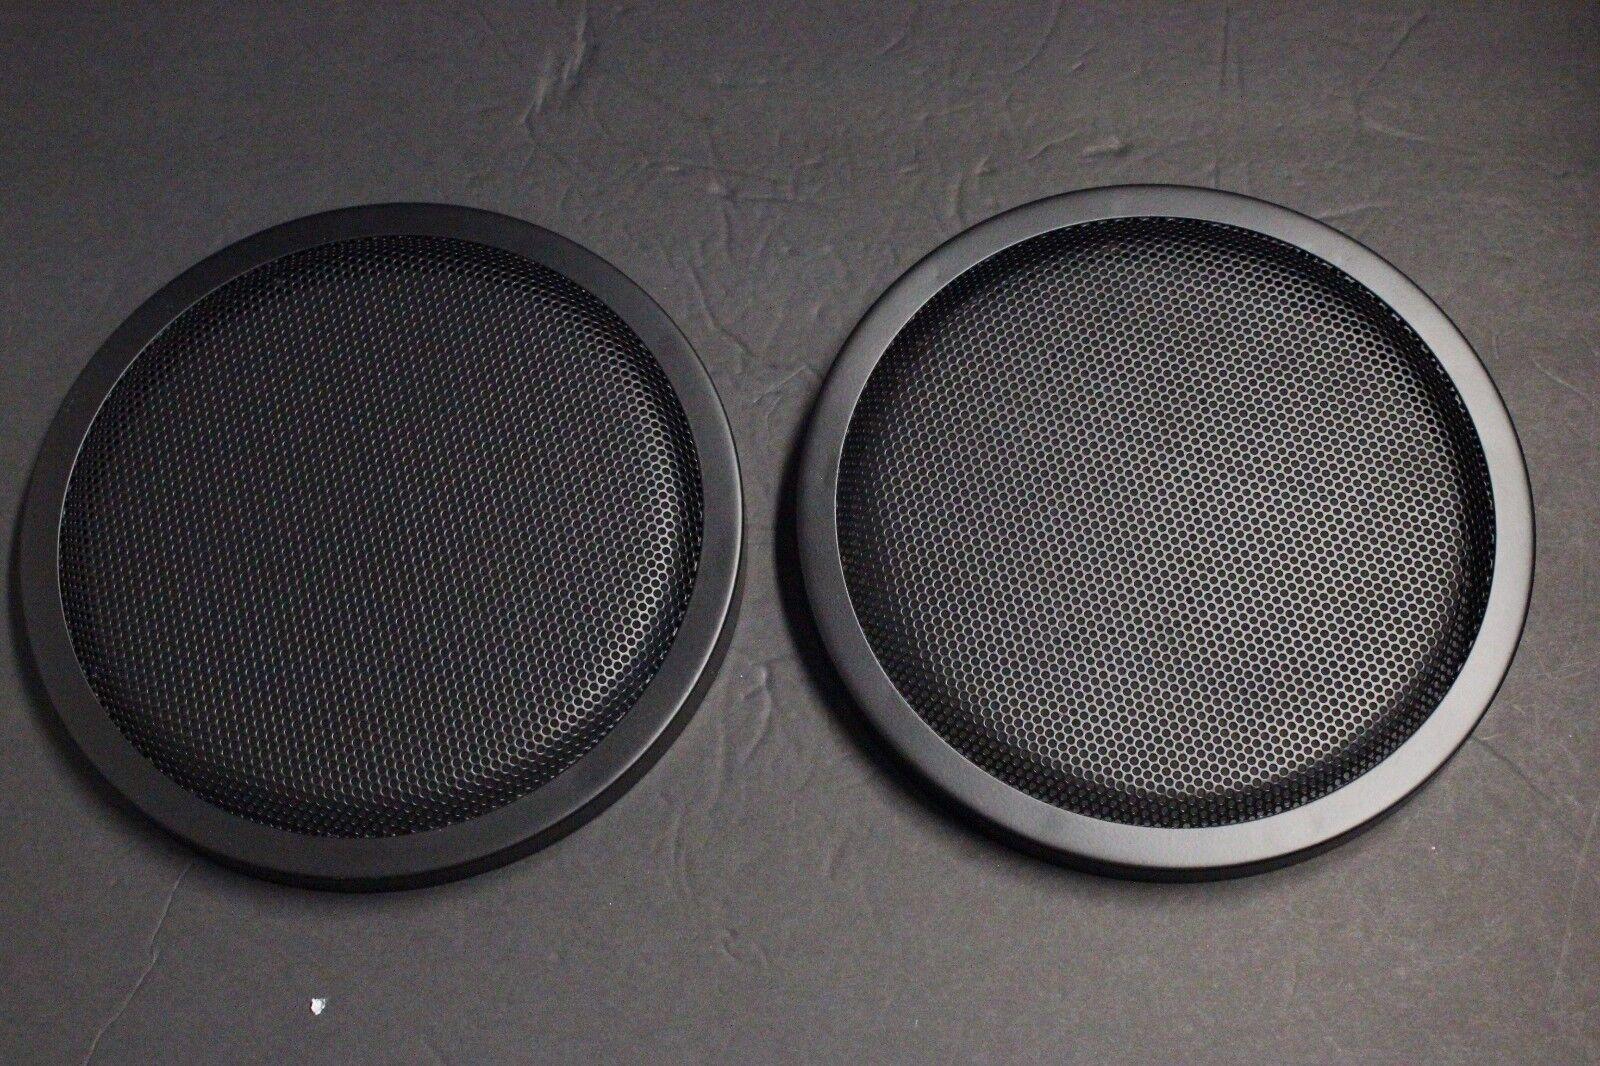 Imc 4 Speakers Cover 8 Car Speaker Steel Mesh Sub Woofer Subwoofer Grill